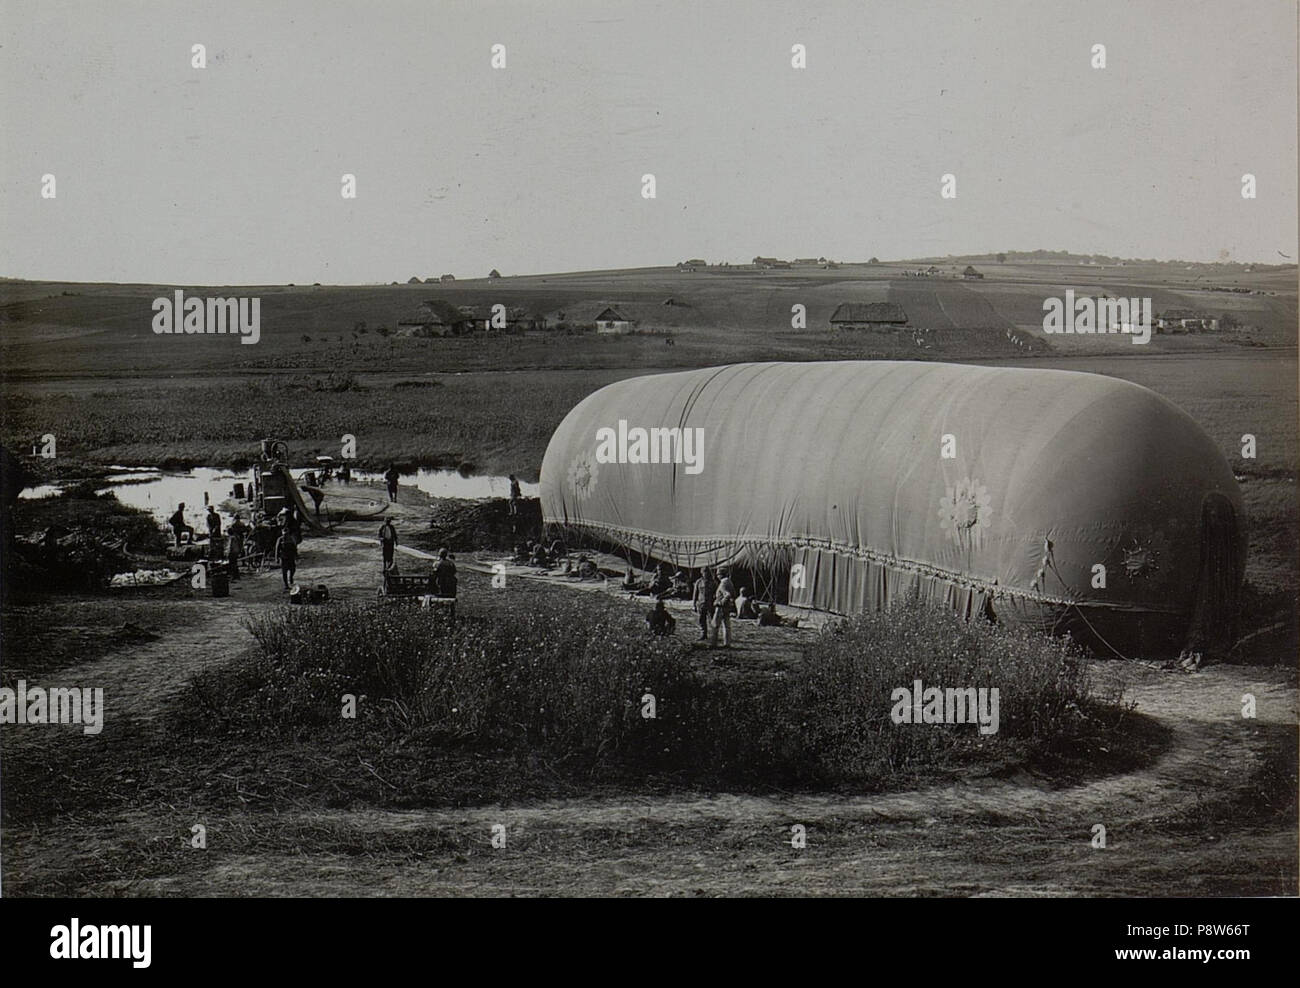 50 Ballon beim Füllen, Ballonabteilung 3-2.R. Milza (BildID 15442328) - Stock Image